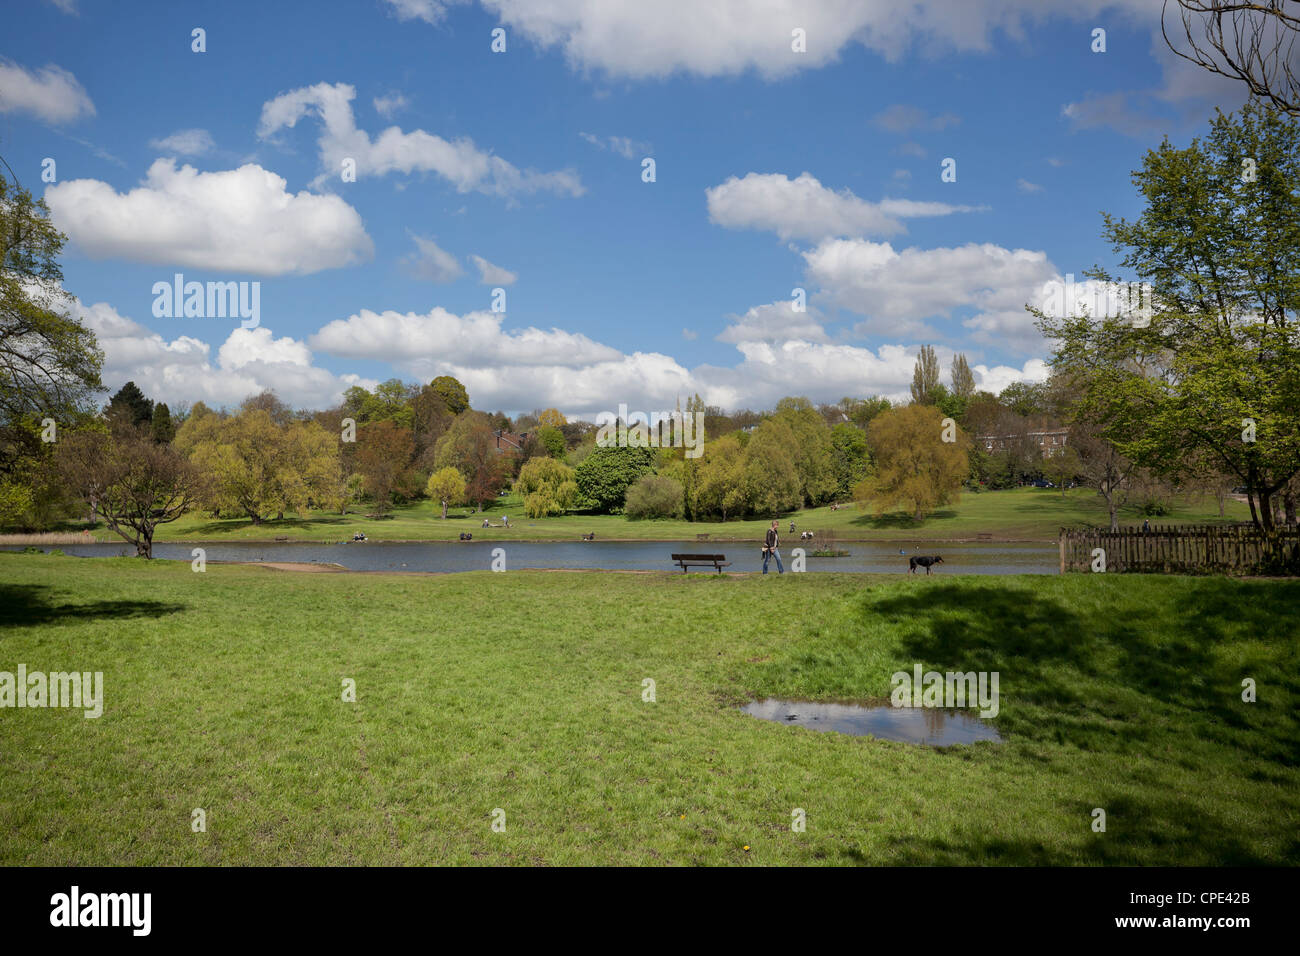 Hampstead Heath, Highgate, London, England, UK. - Stock Image